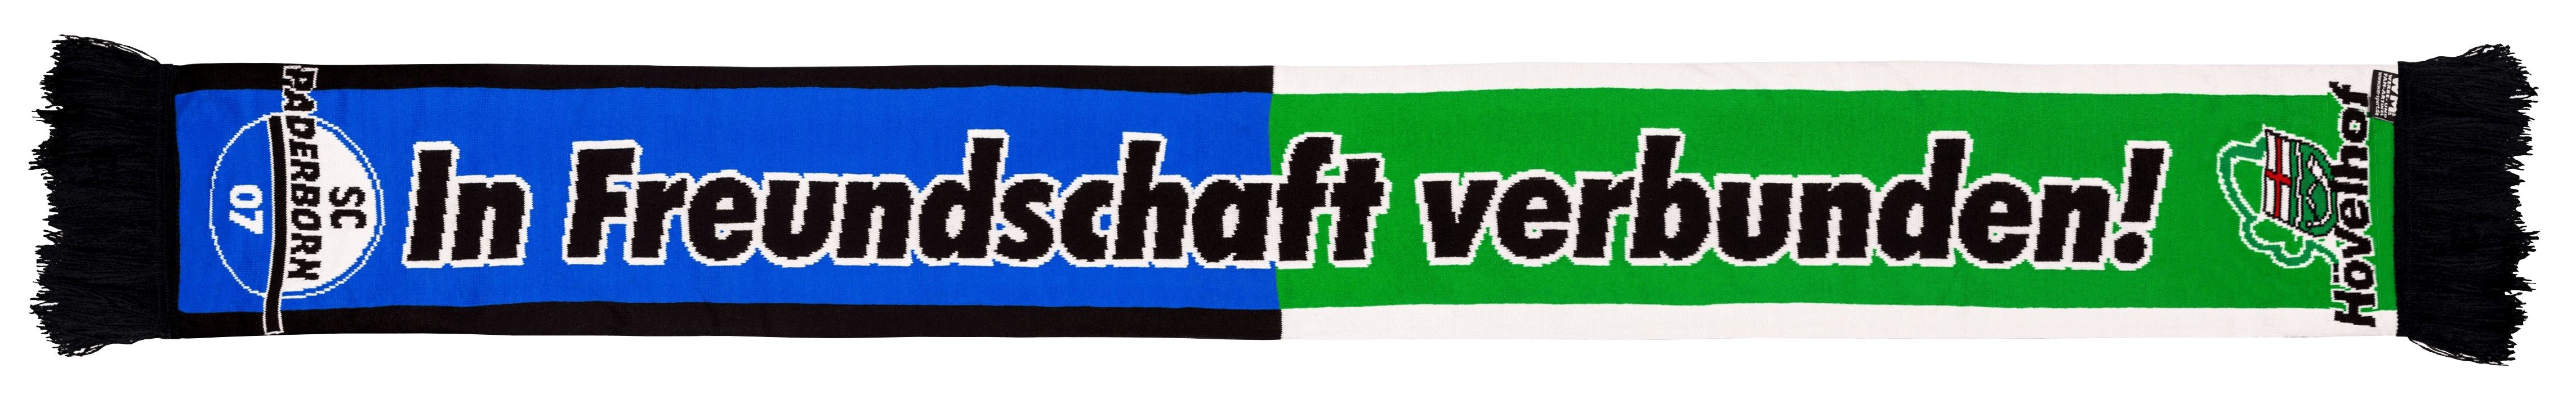 Schal SCP07 & Hövelhof